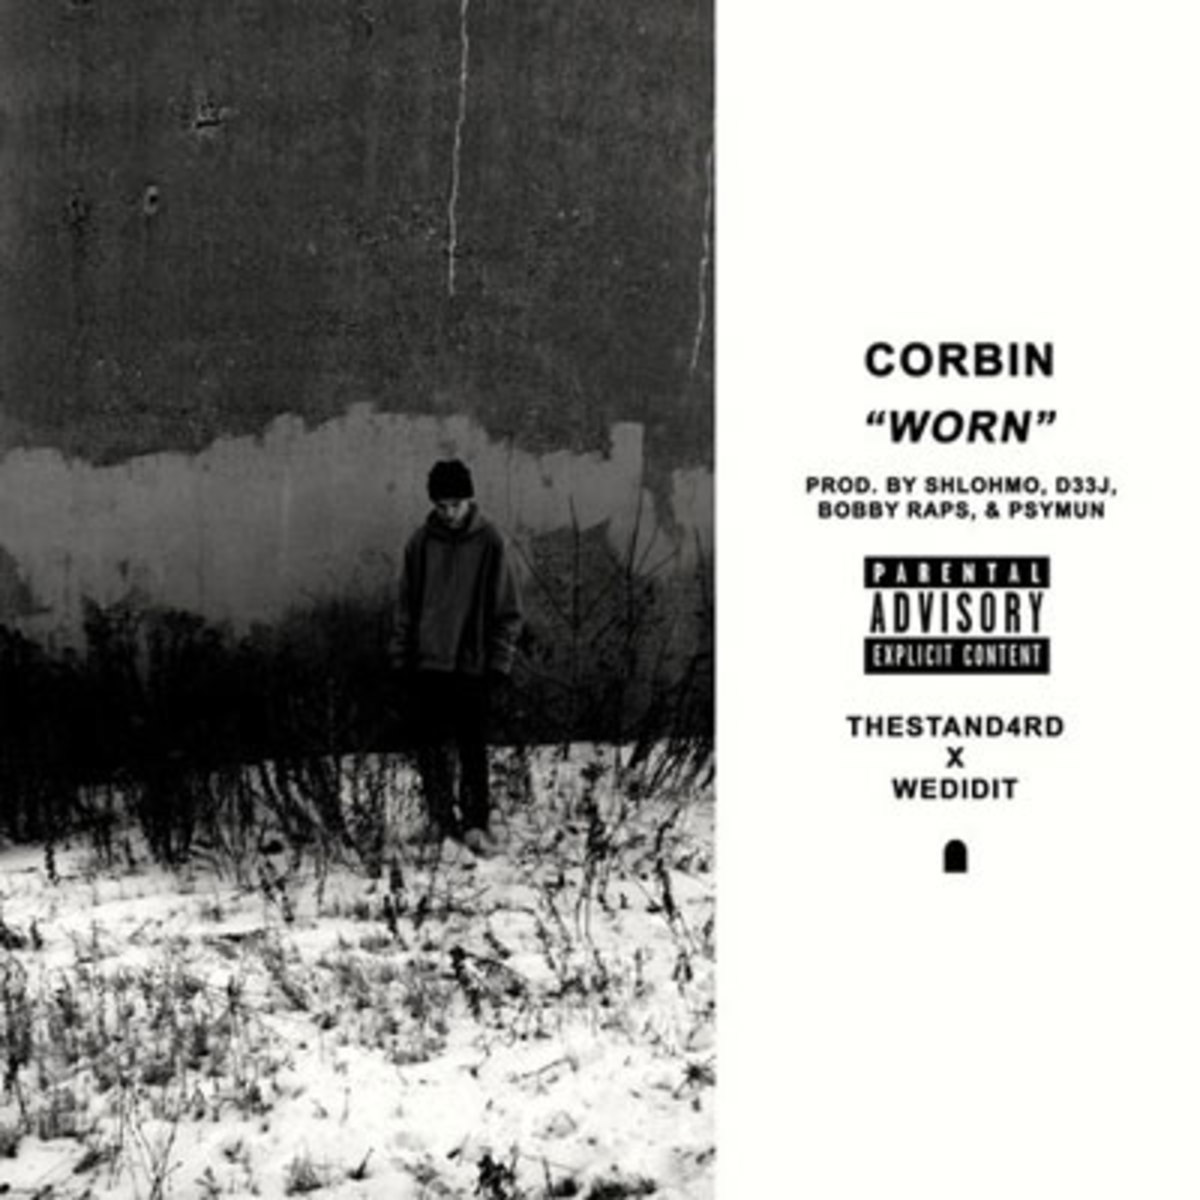 corbin-worn.jpg